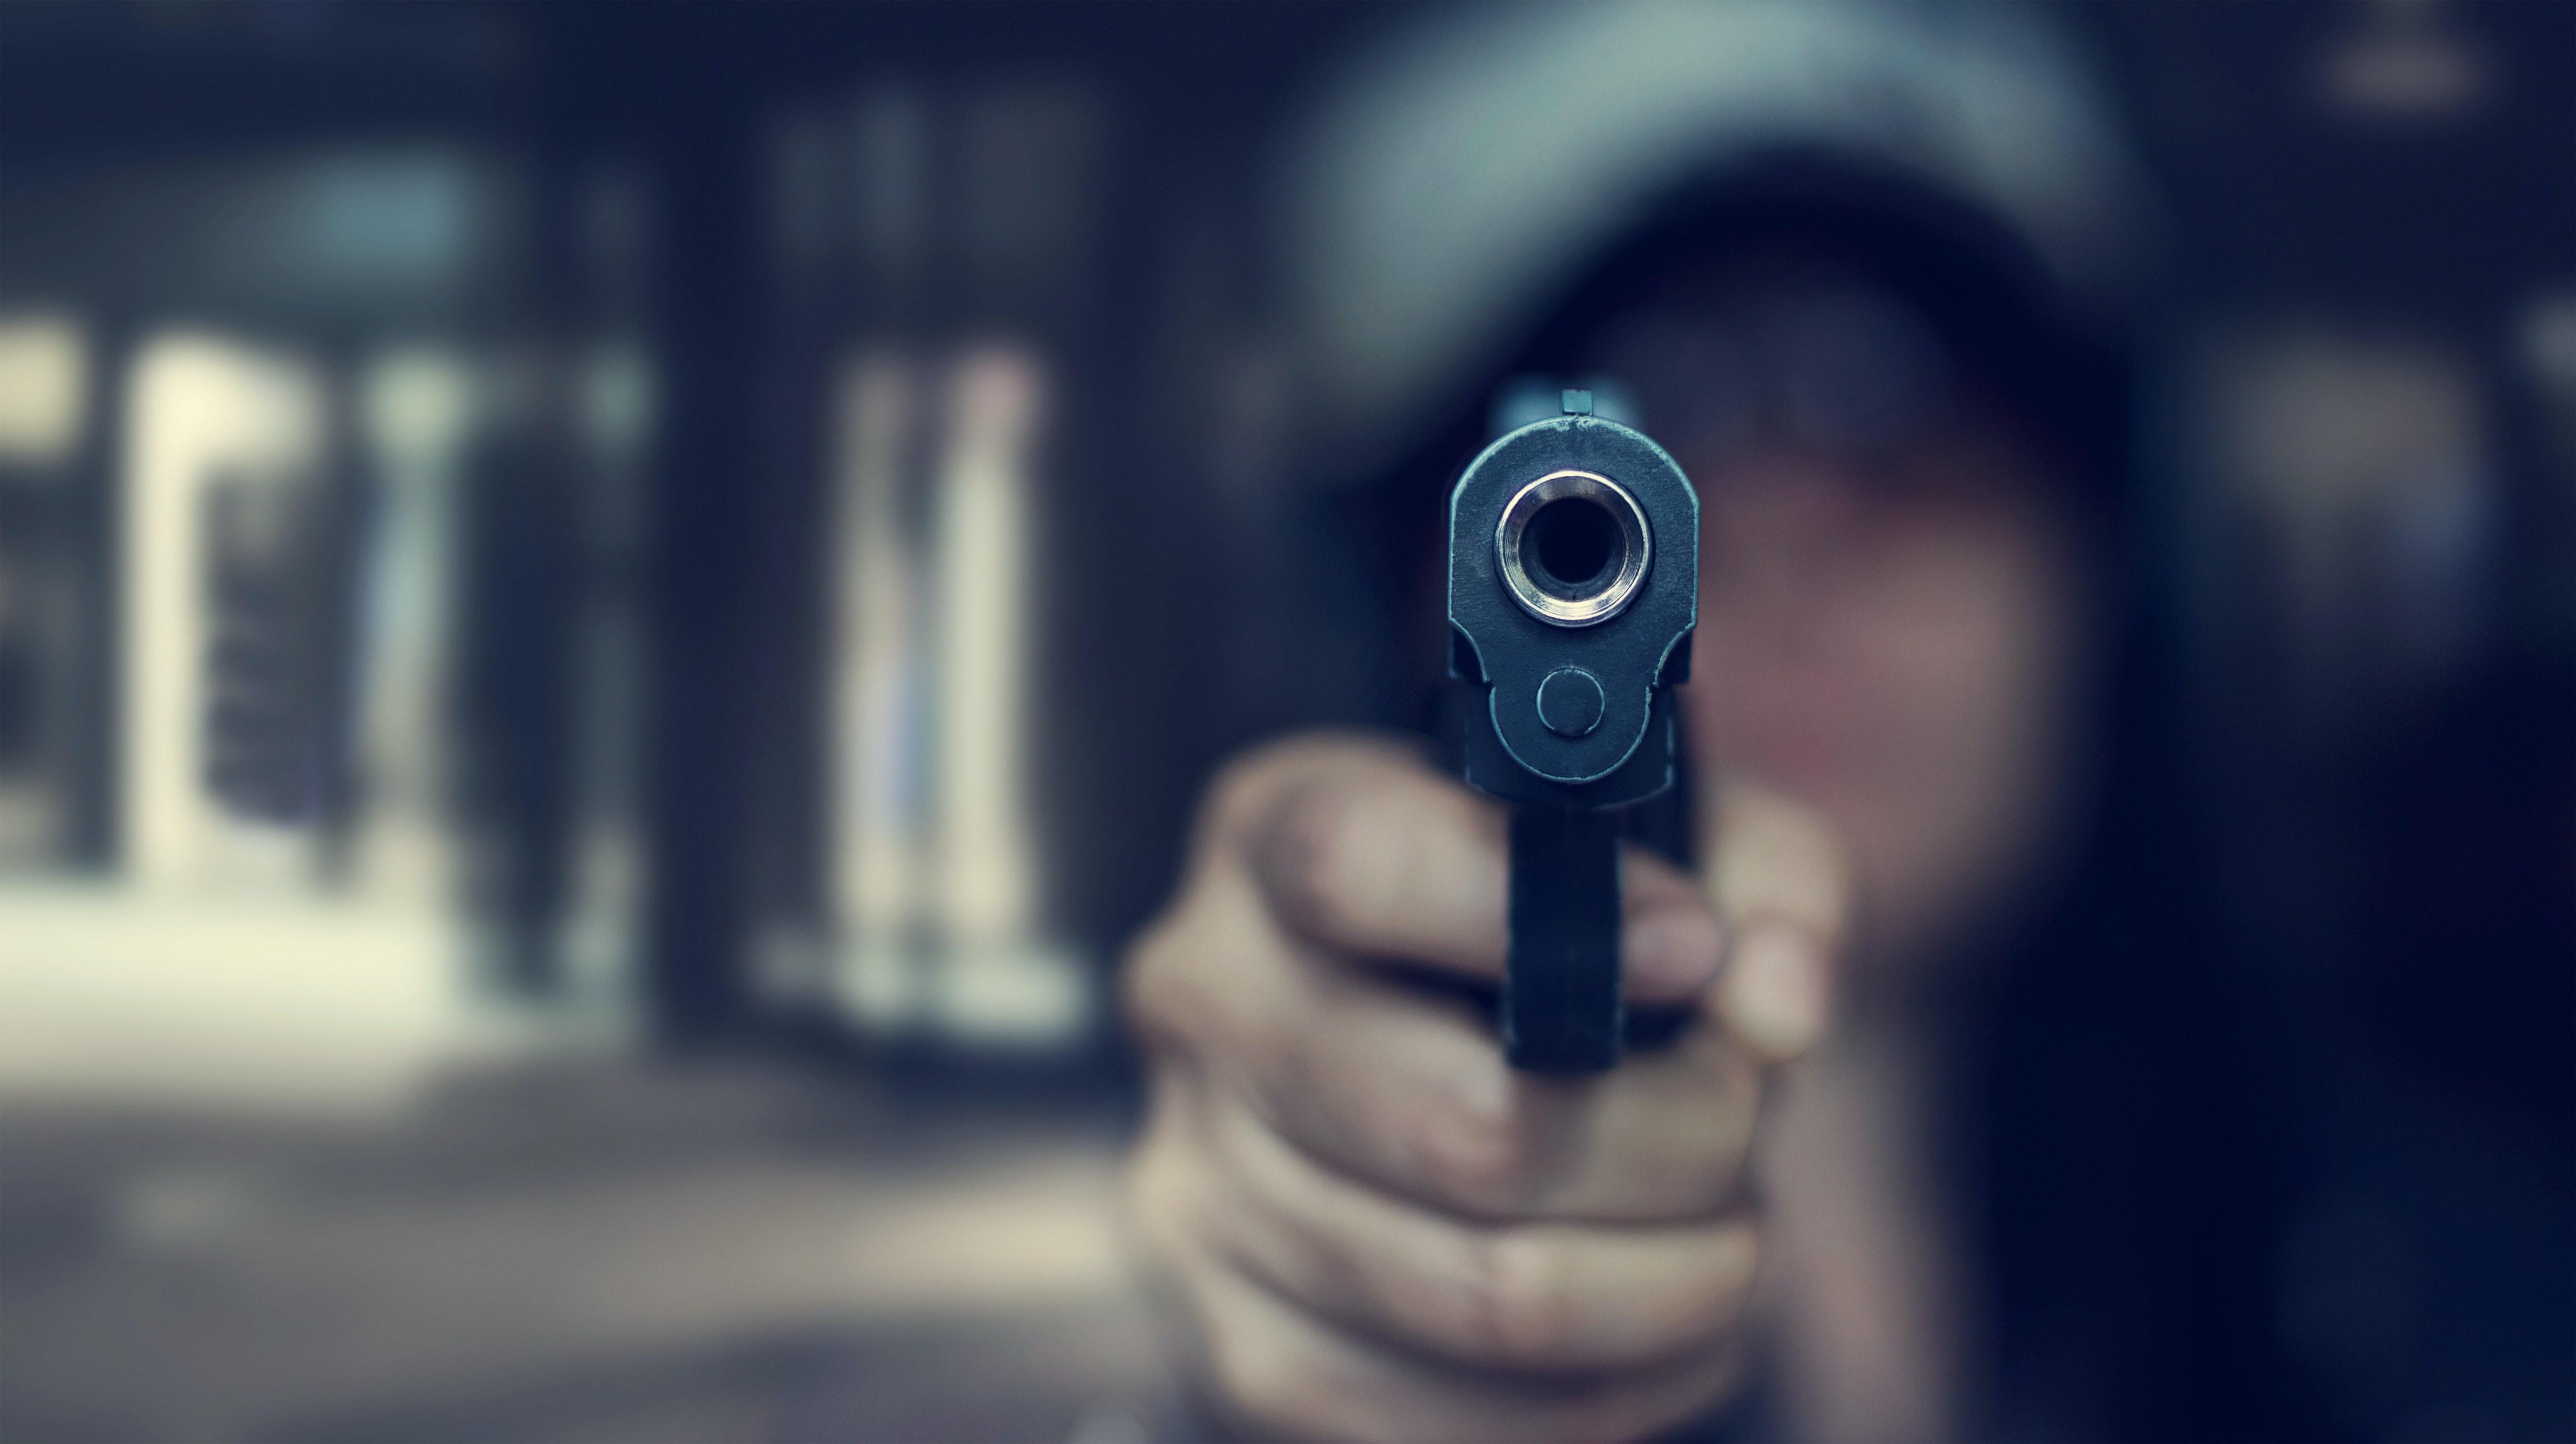 Brits don't acknowledge their gun problem